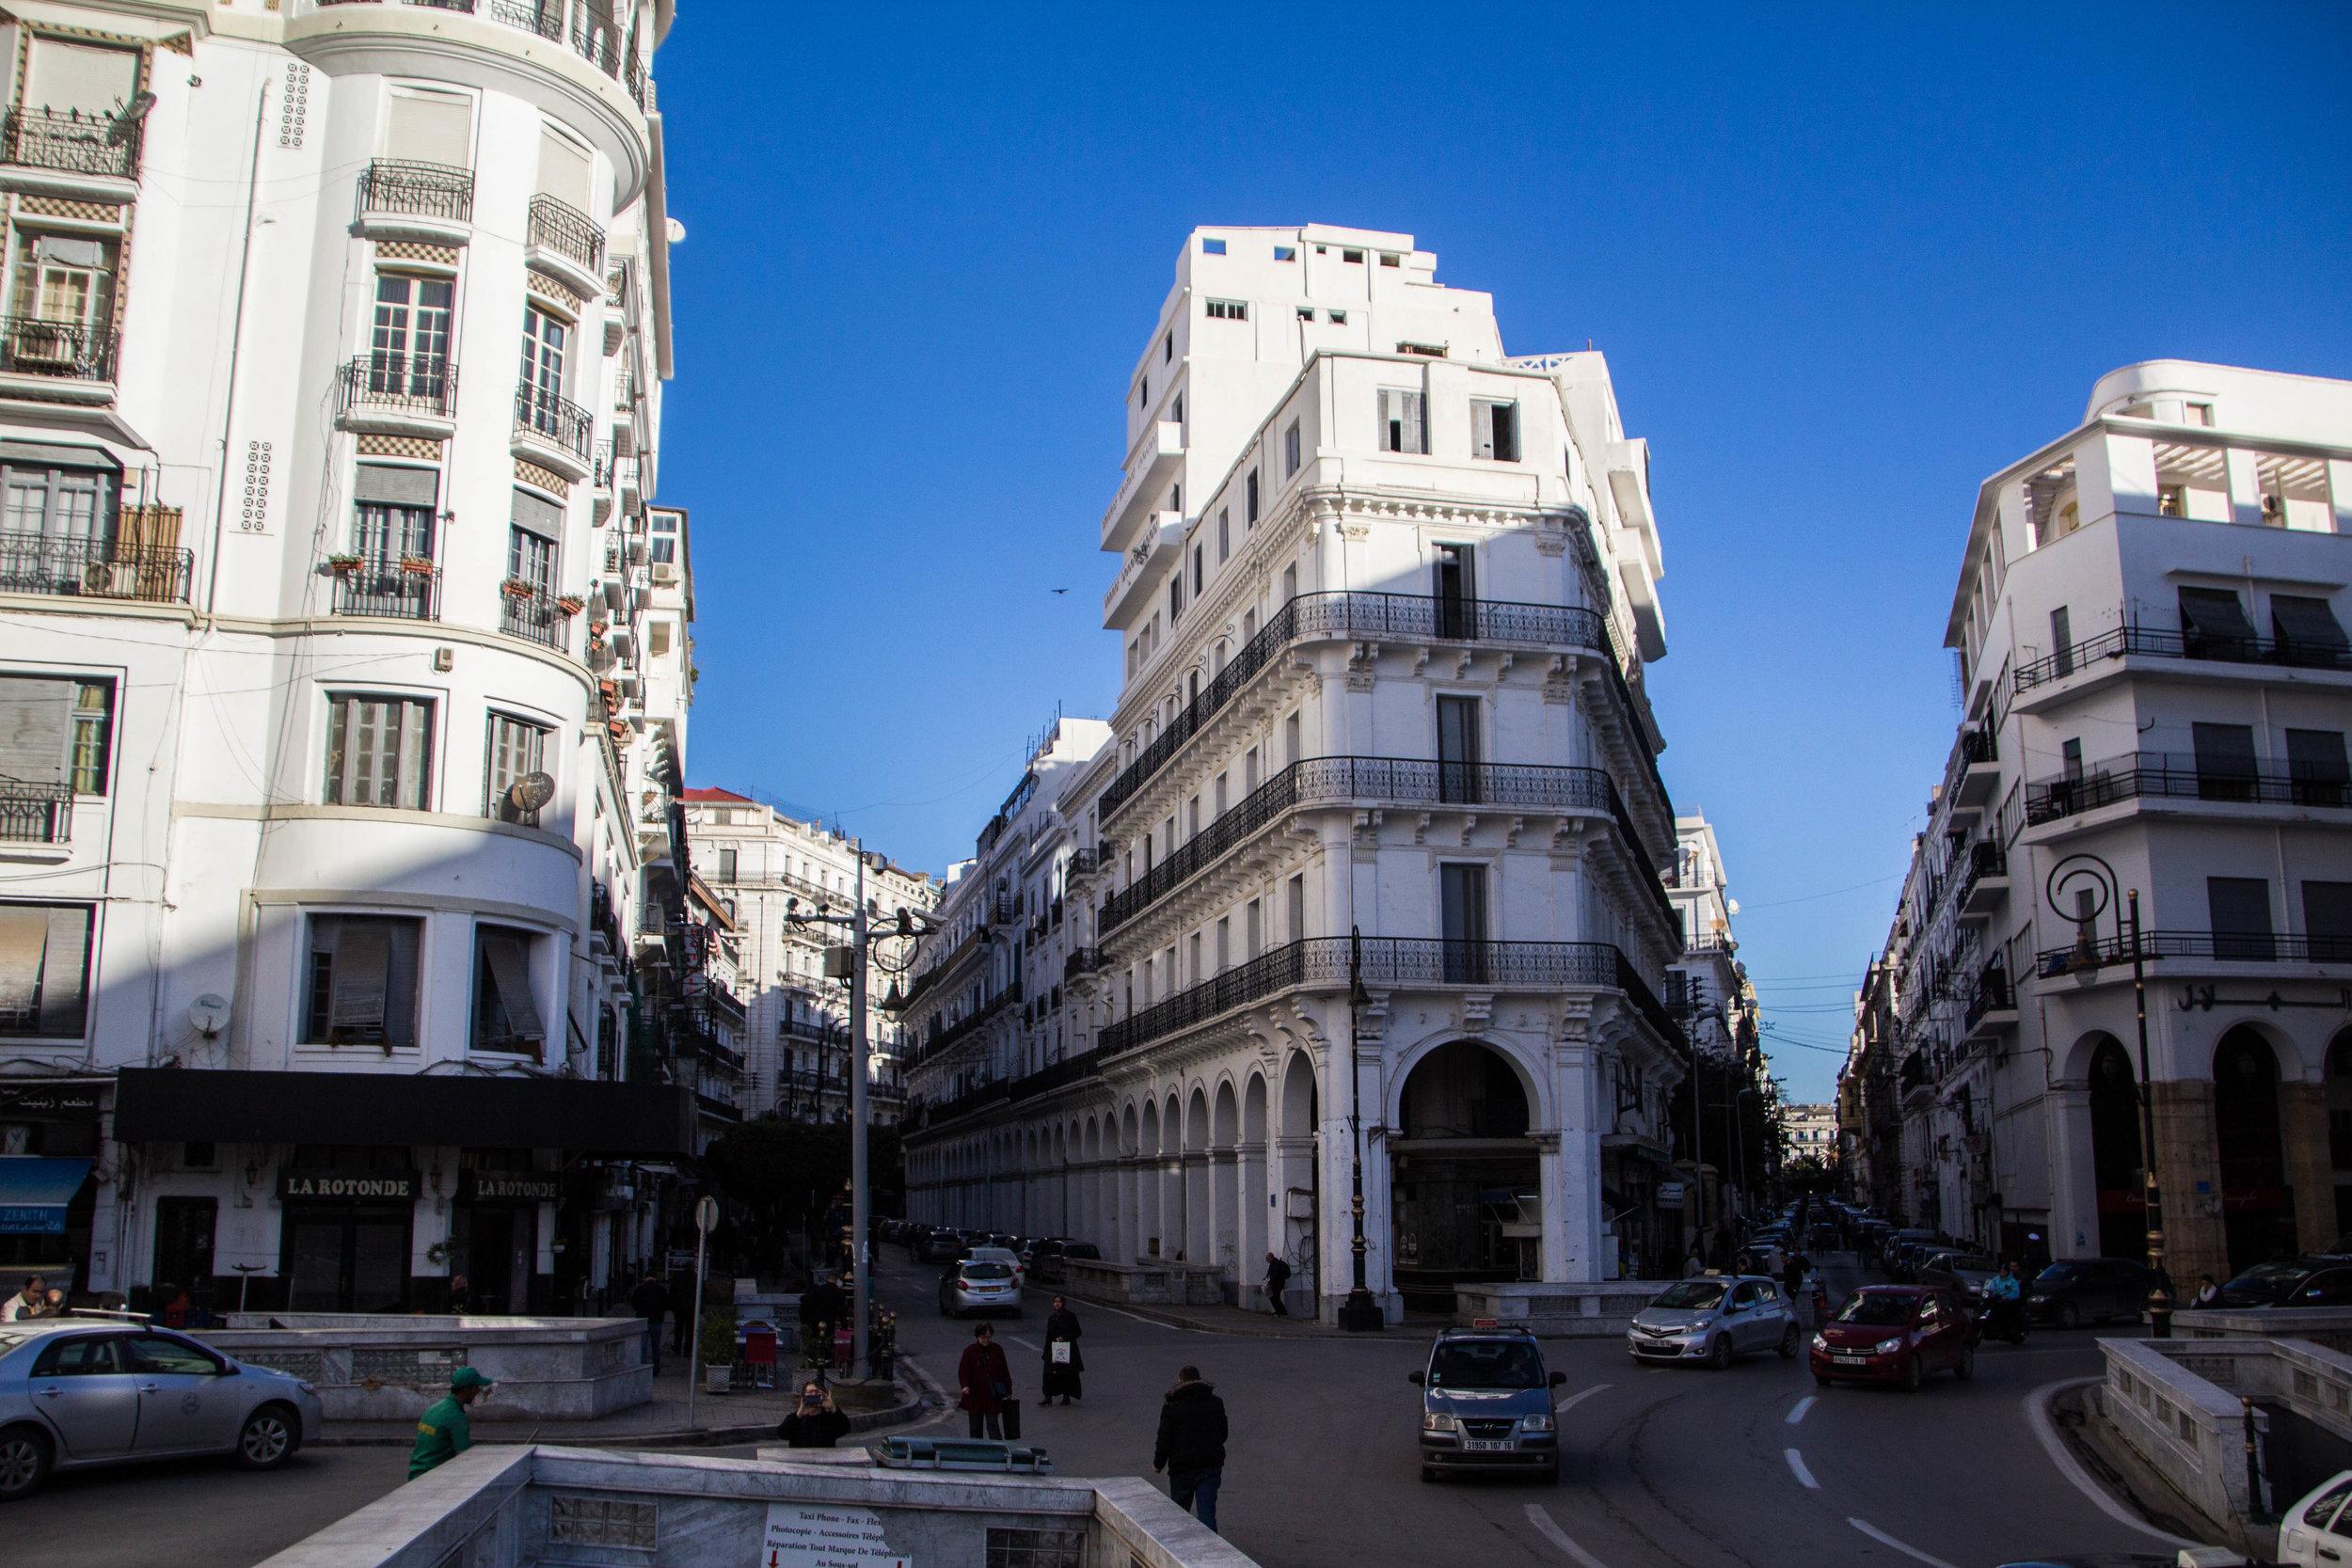 street-photography-algiers-algeria-22.jpg